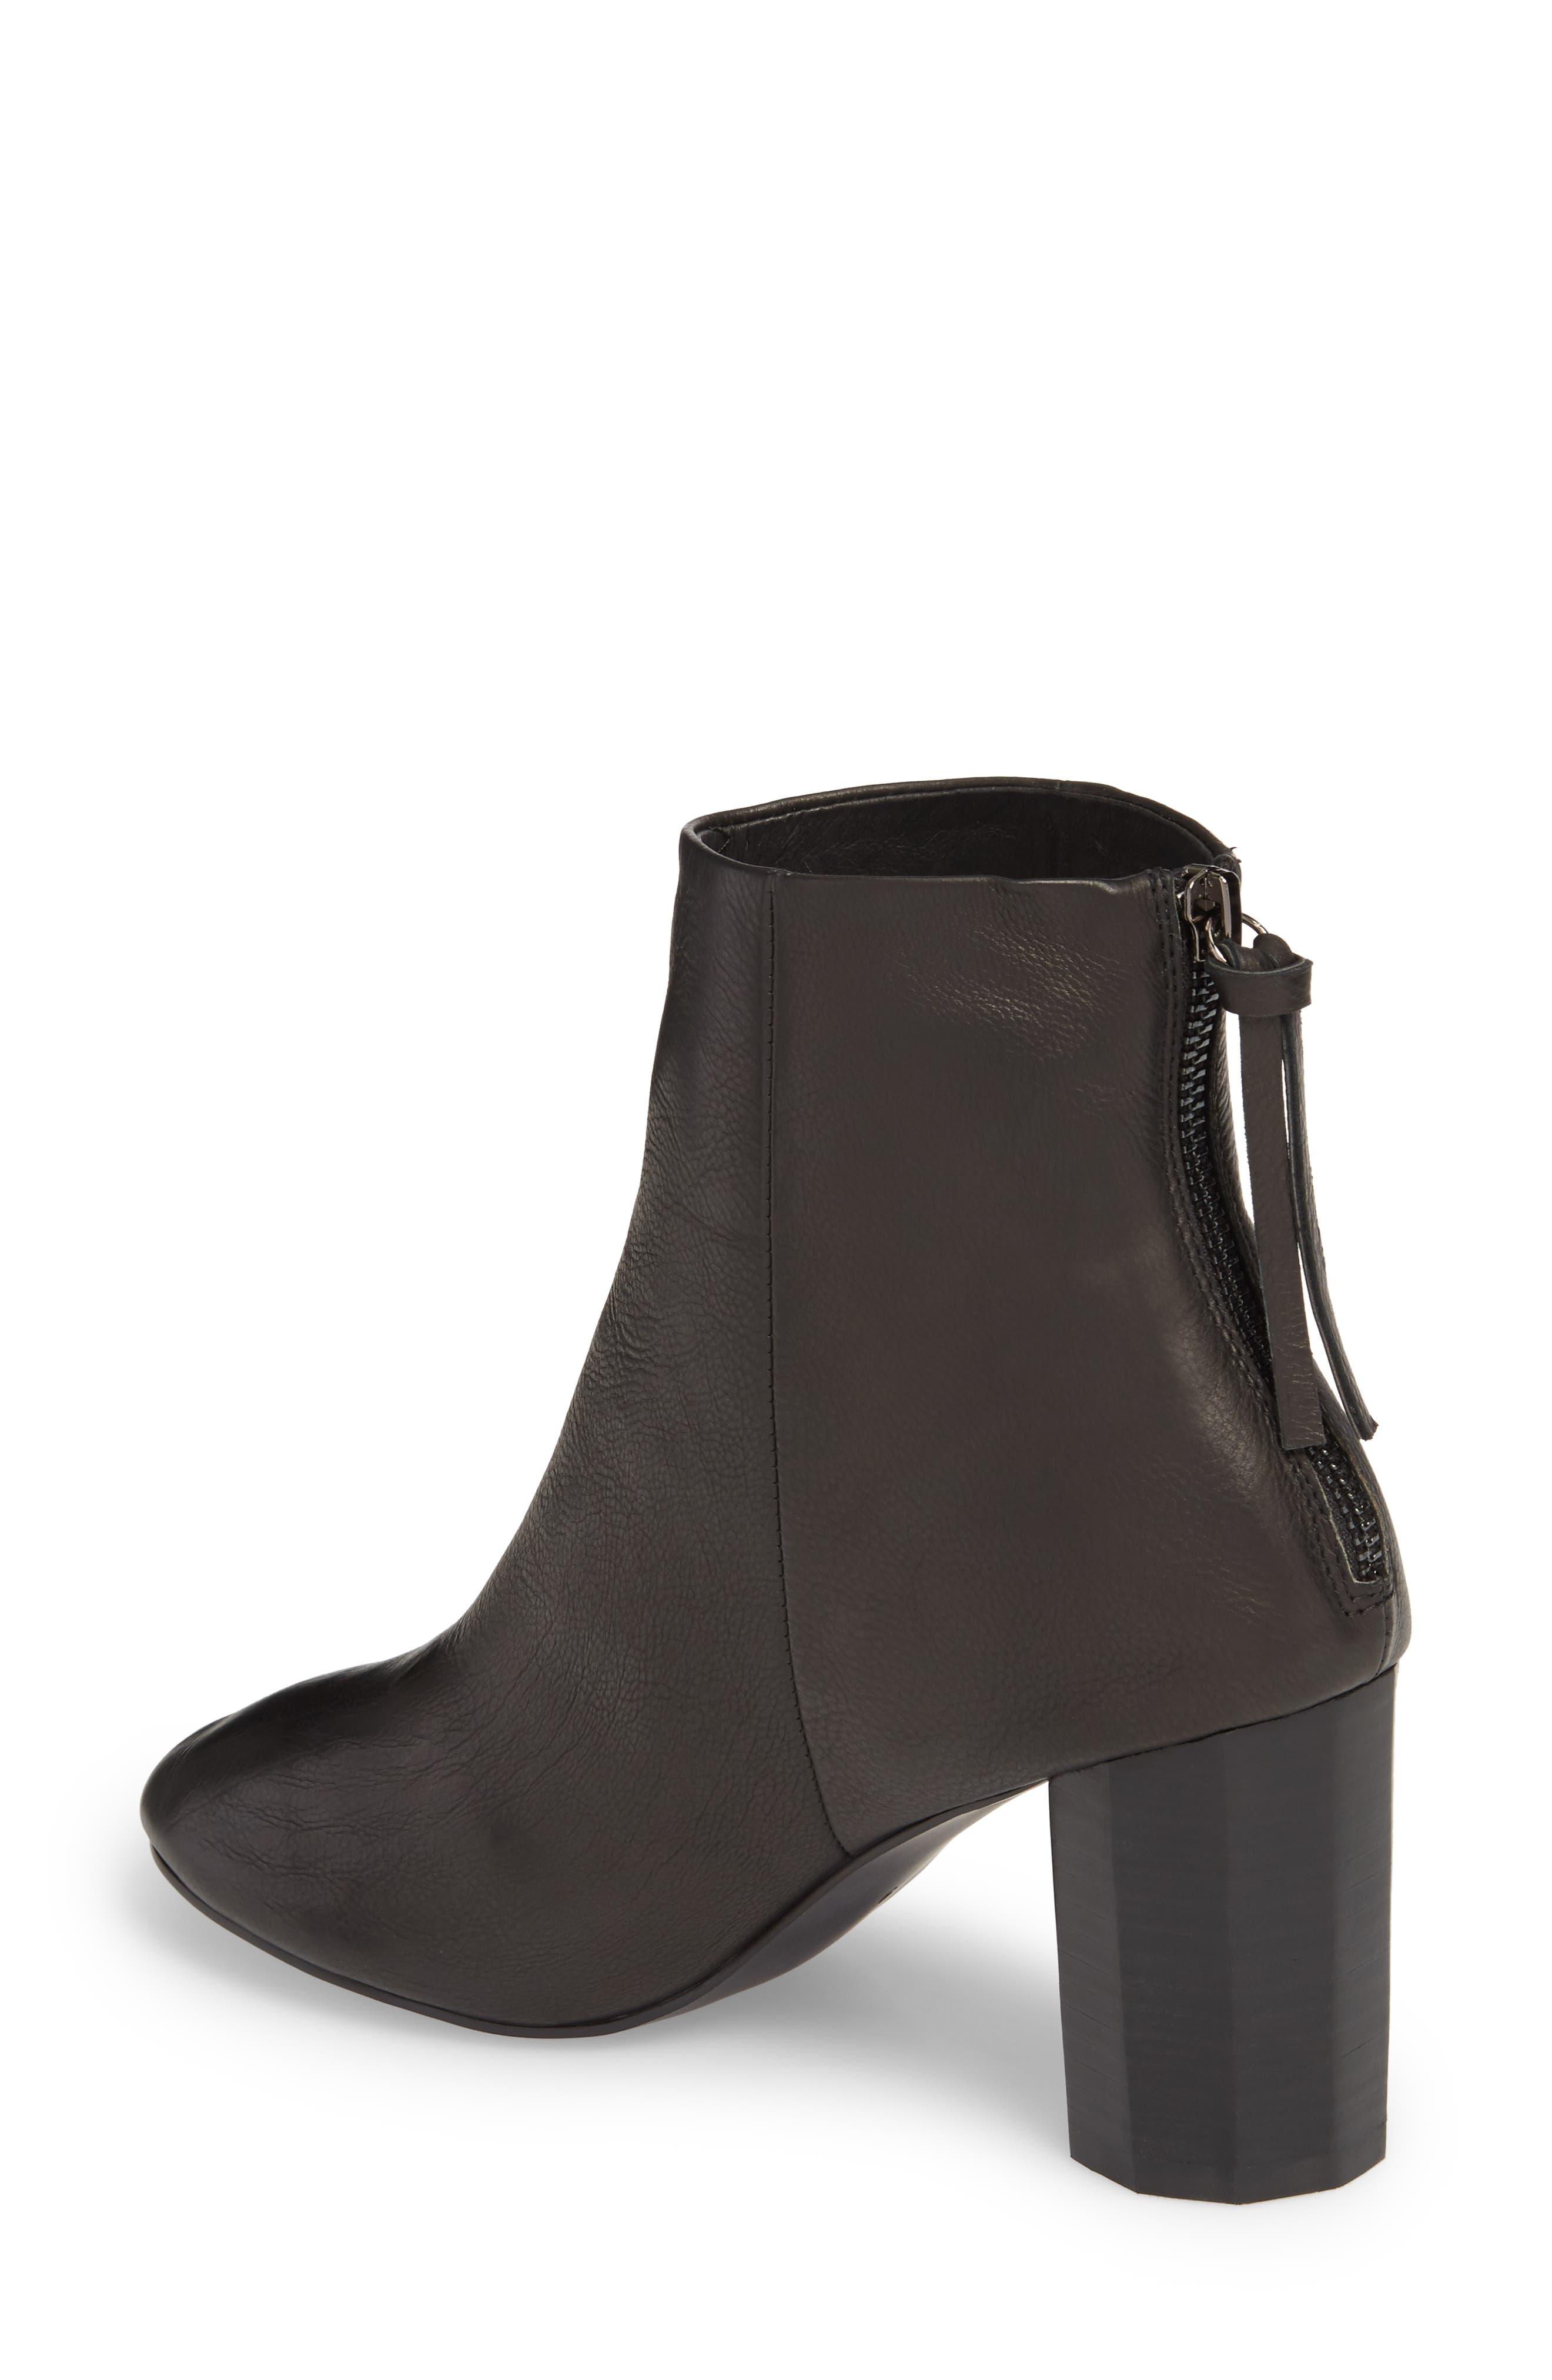 Sadie Column Heel Bootie,                             Alternate thumbnail 2, color,                             Black Leather